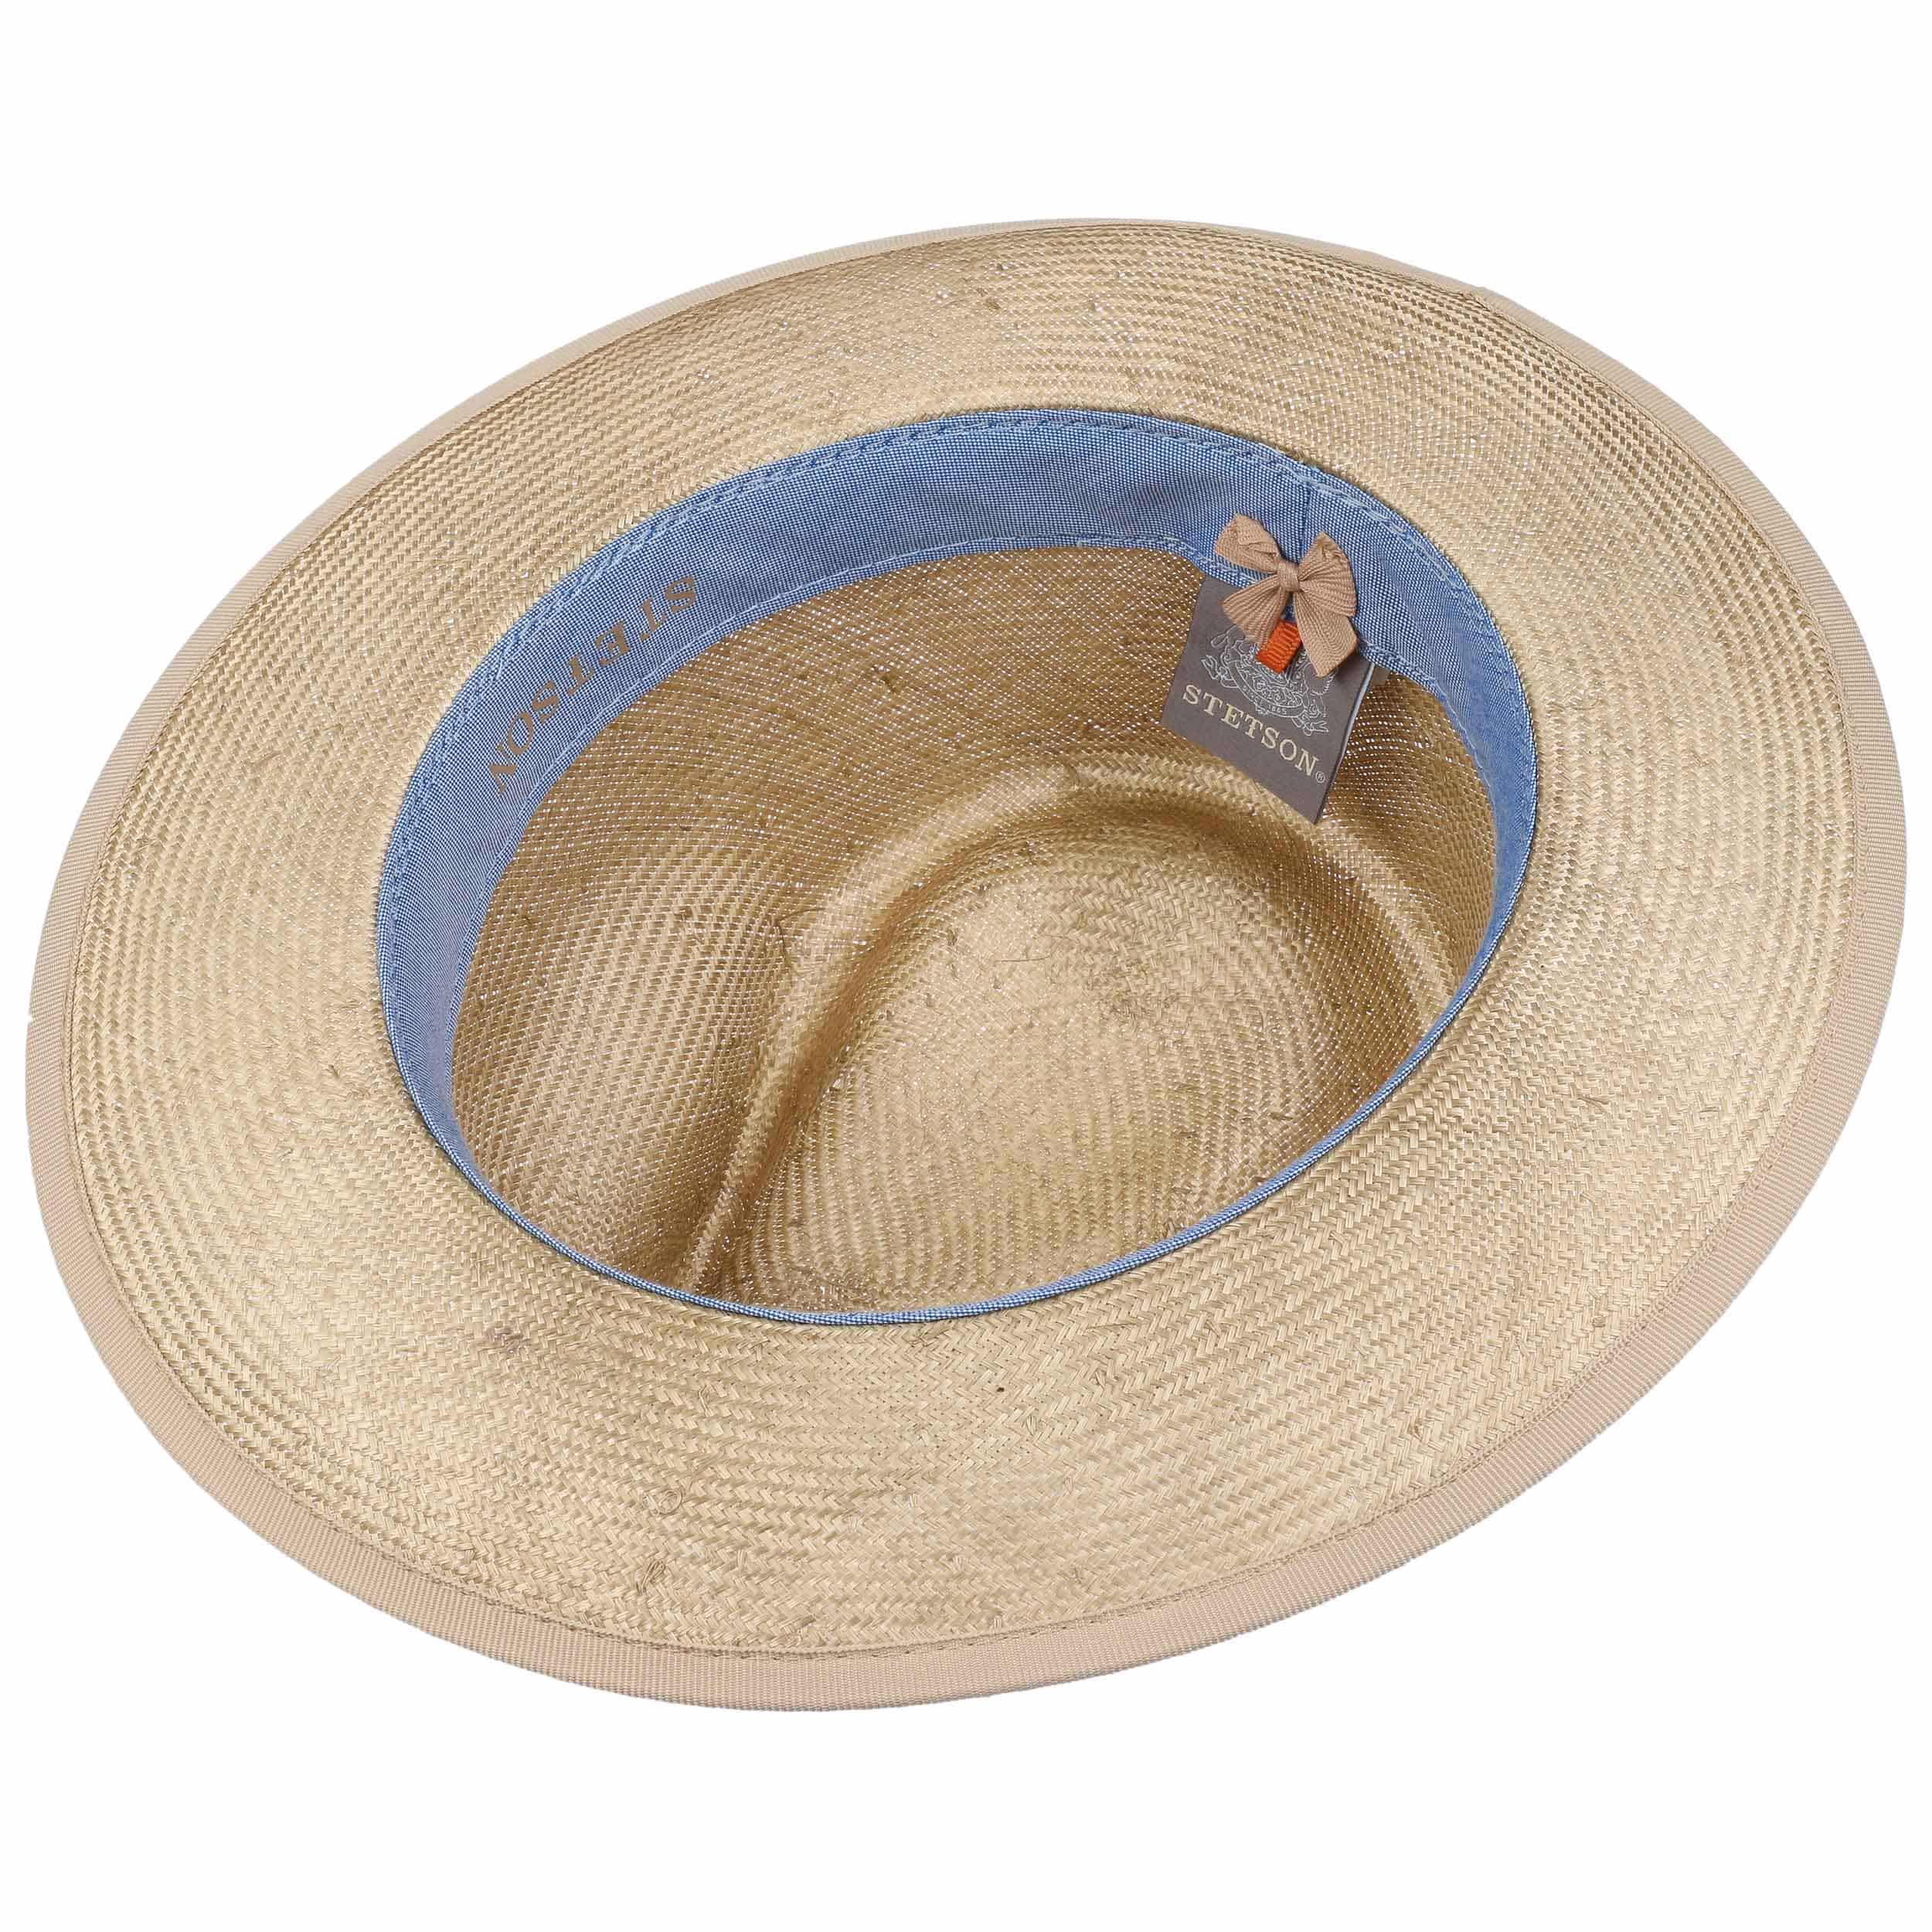 Abaca Fedora Straw Hat By Stetson 136 95